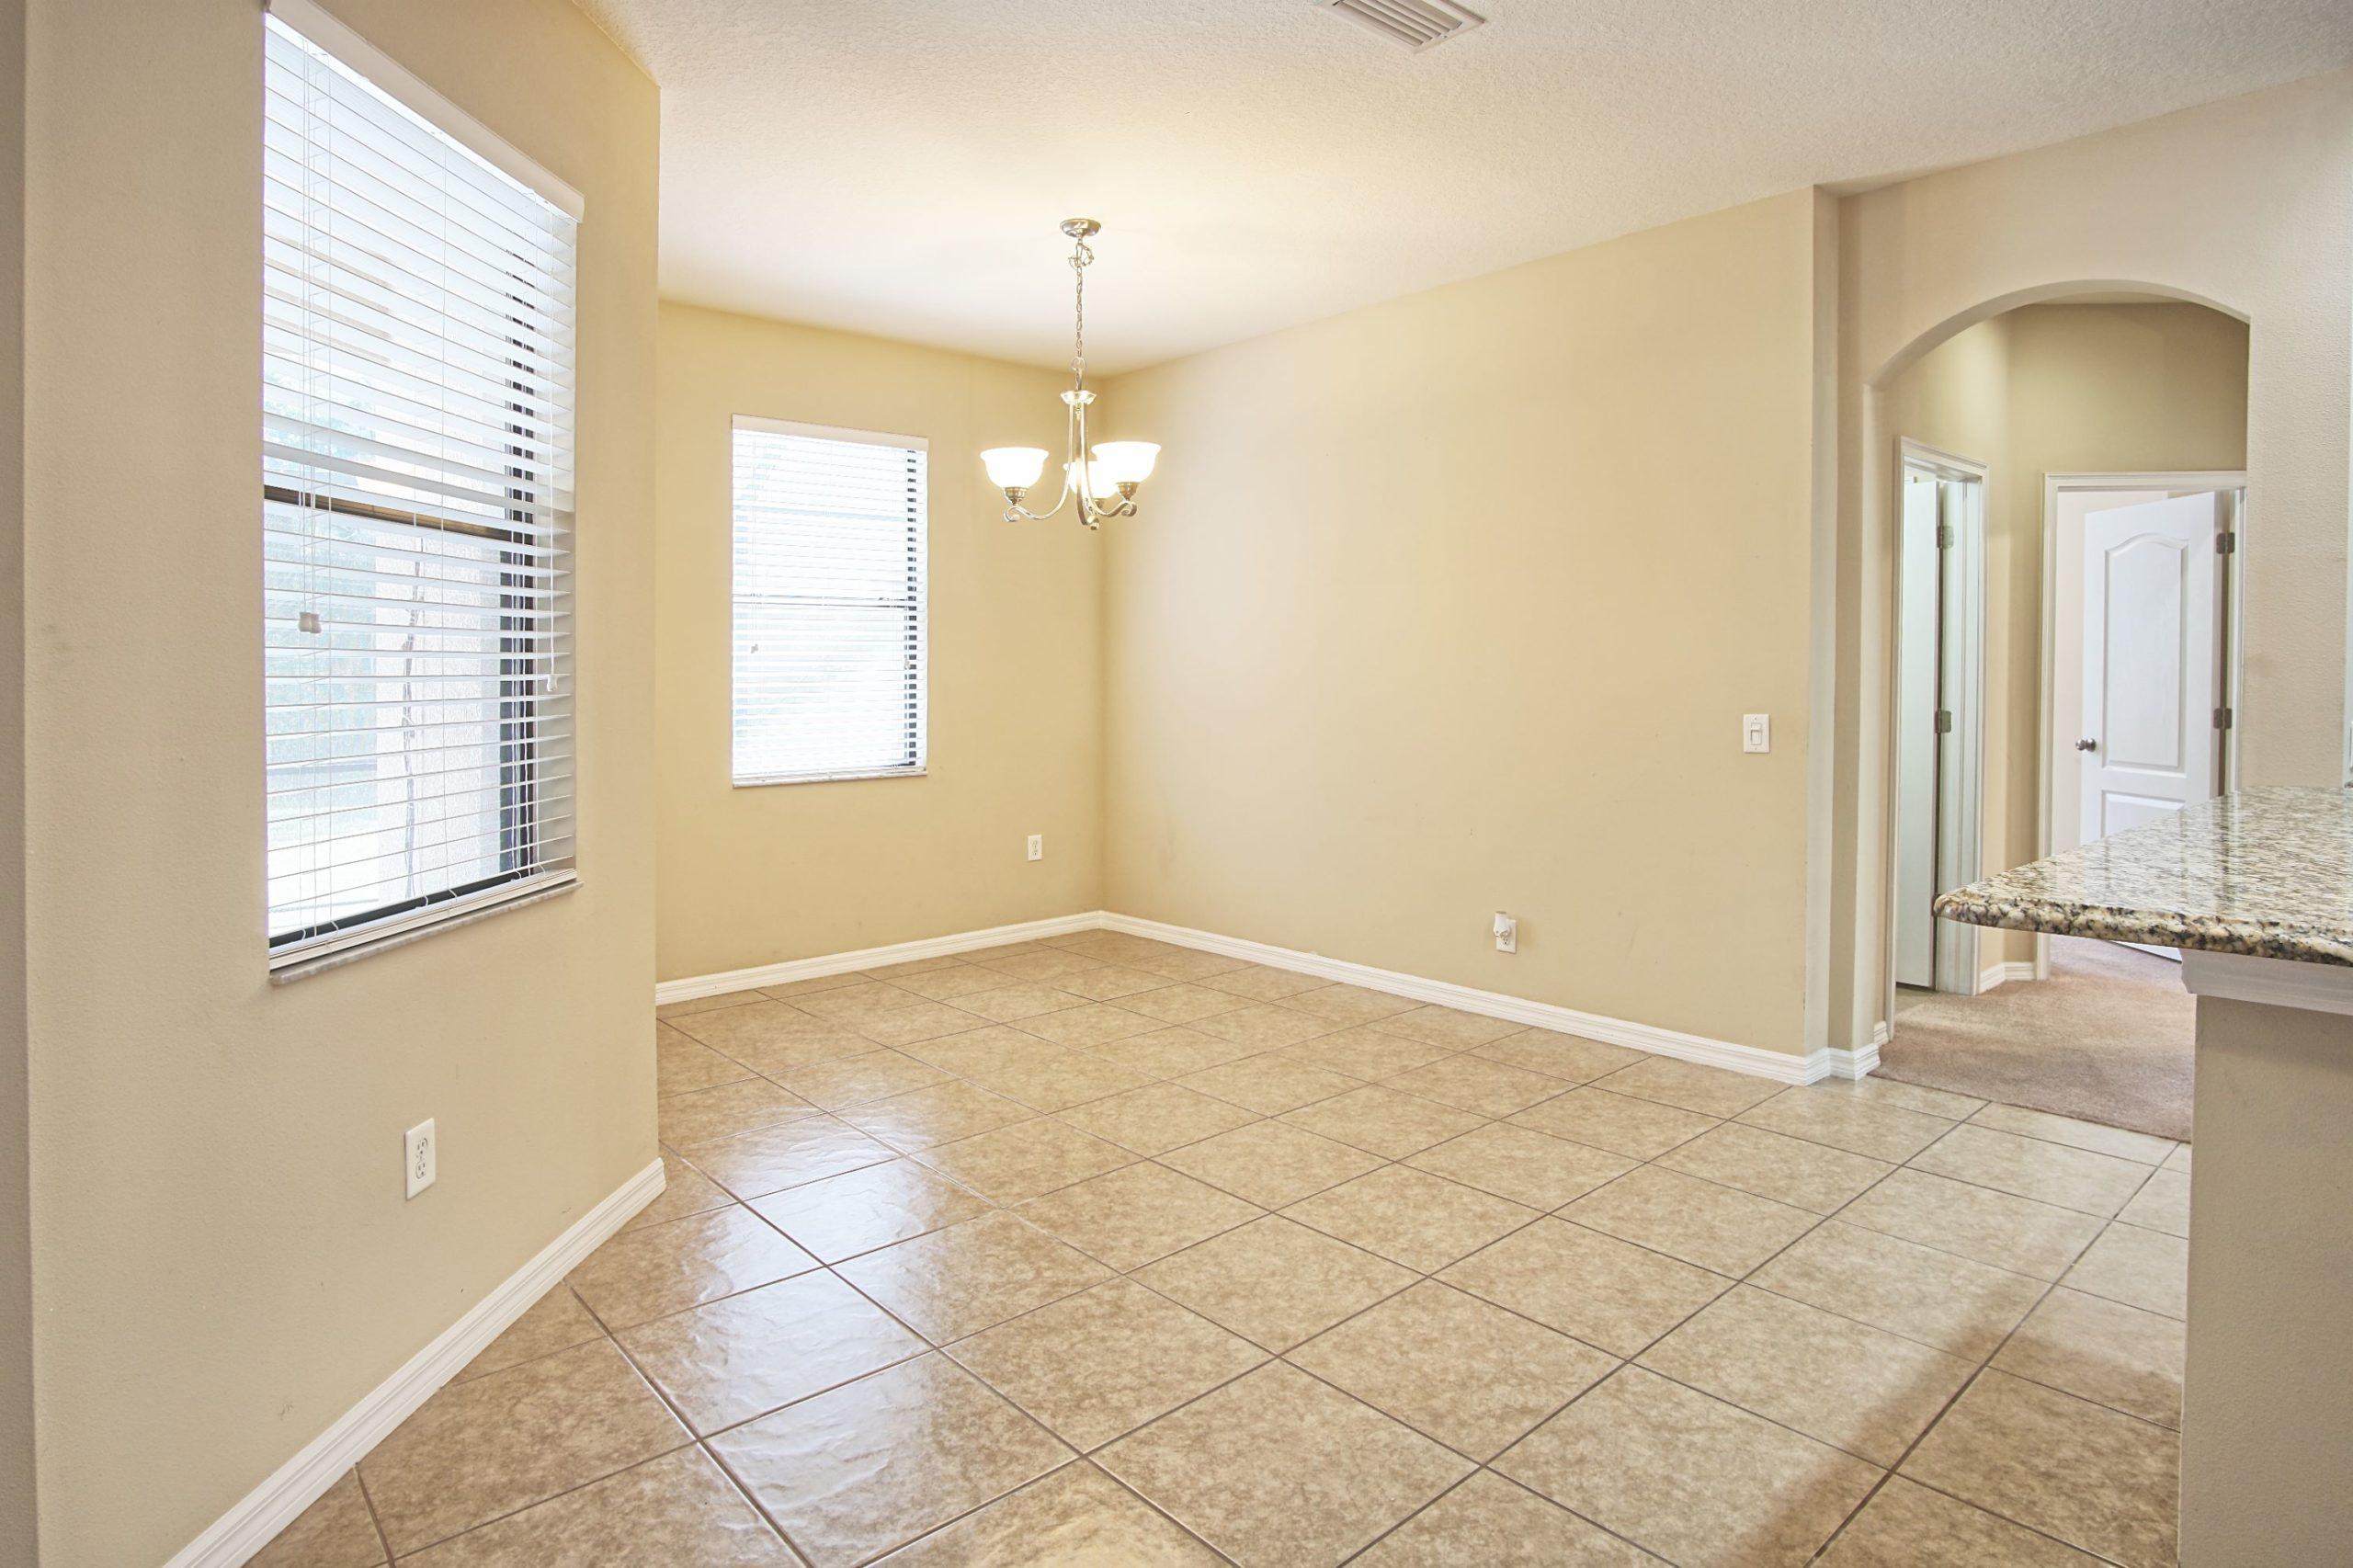 7905 Hamton Lake Dr, Tampa, Grand Hampton, new 2020 (13)